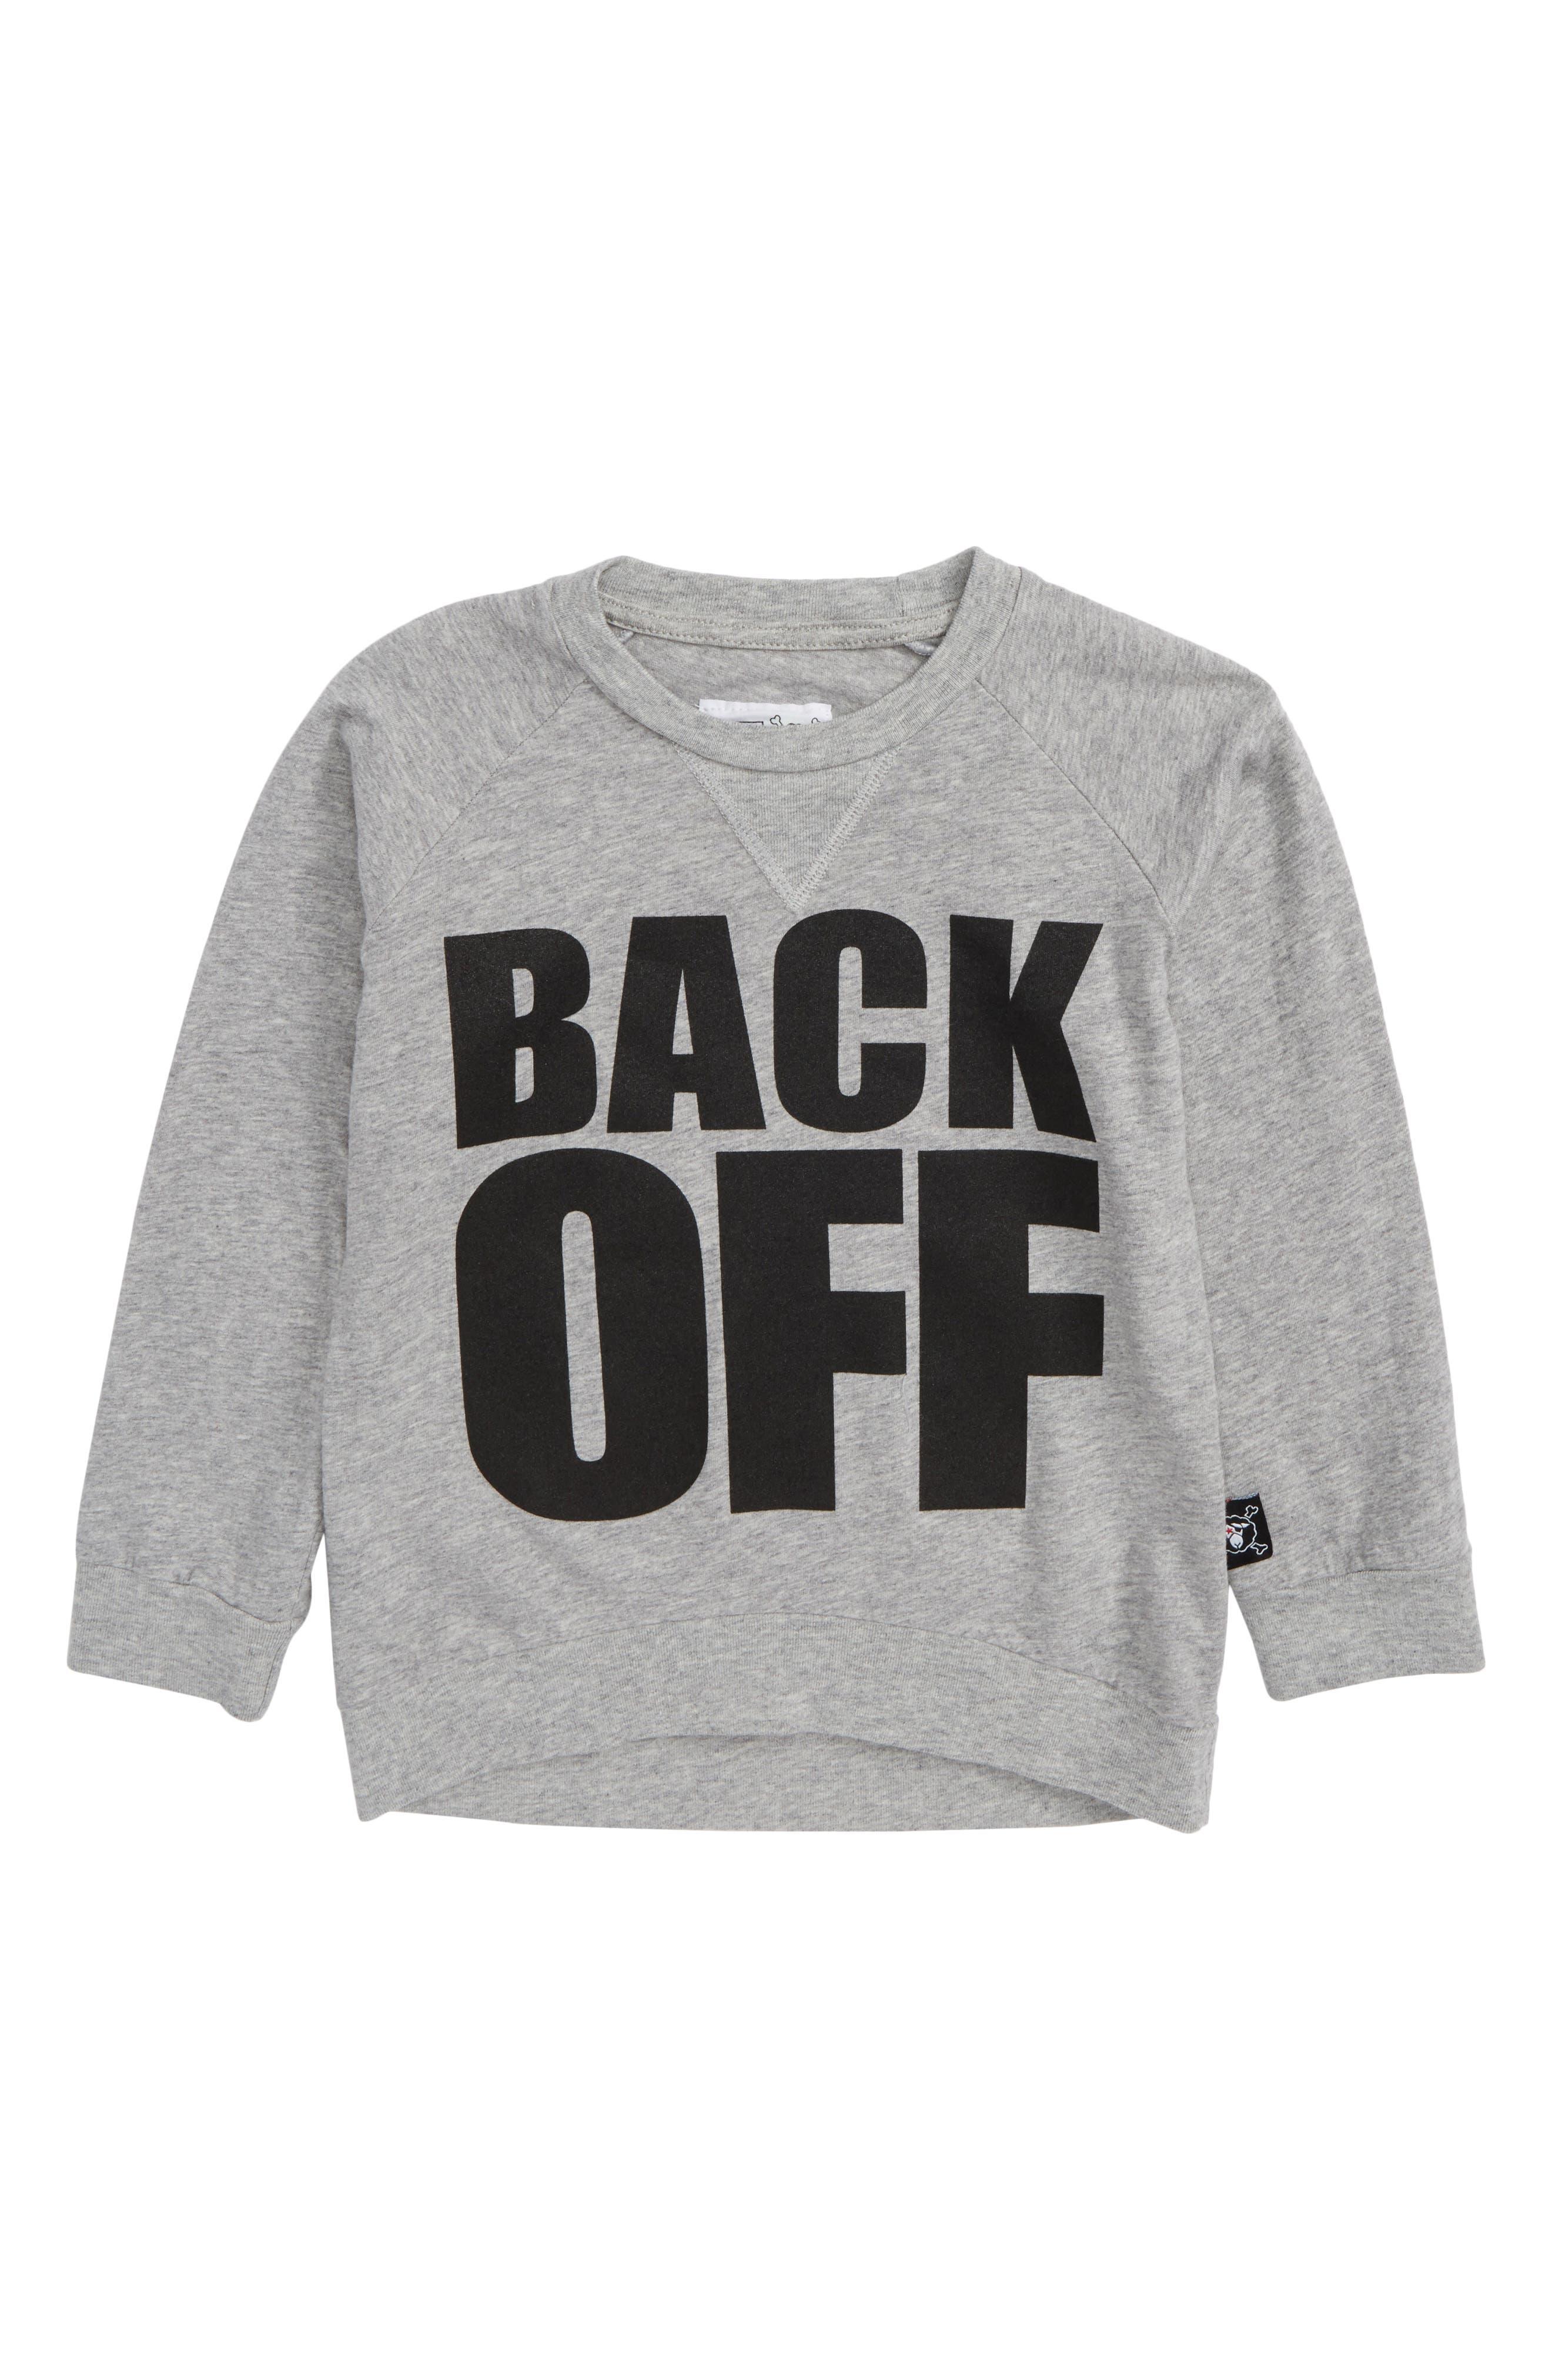 Main Image - Nununu Back Off Graphic T-Shirt (Toddler Boys, Little Boys & Big Boys)